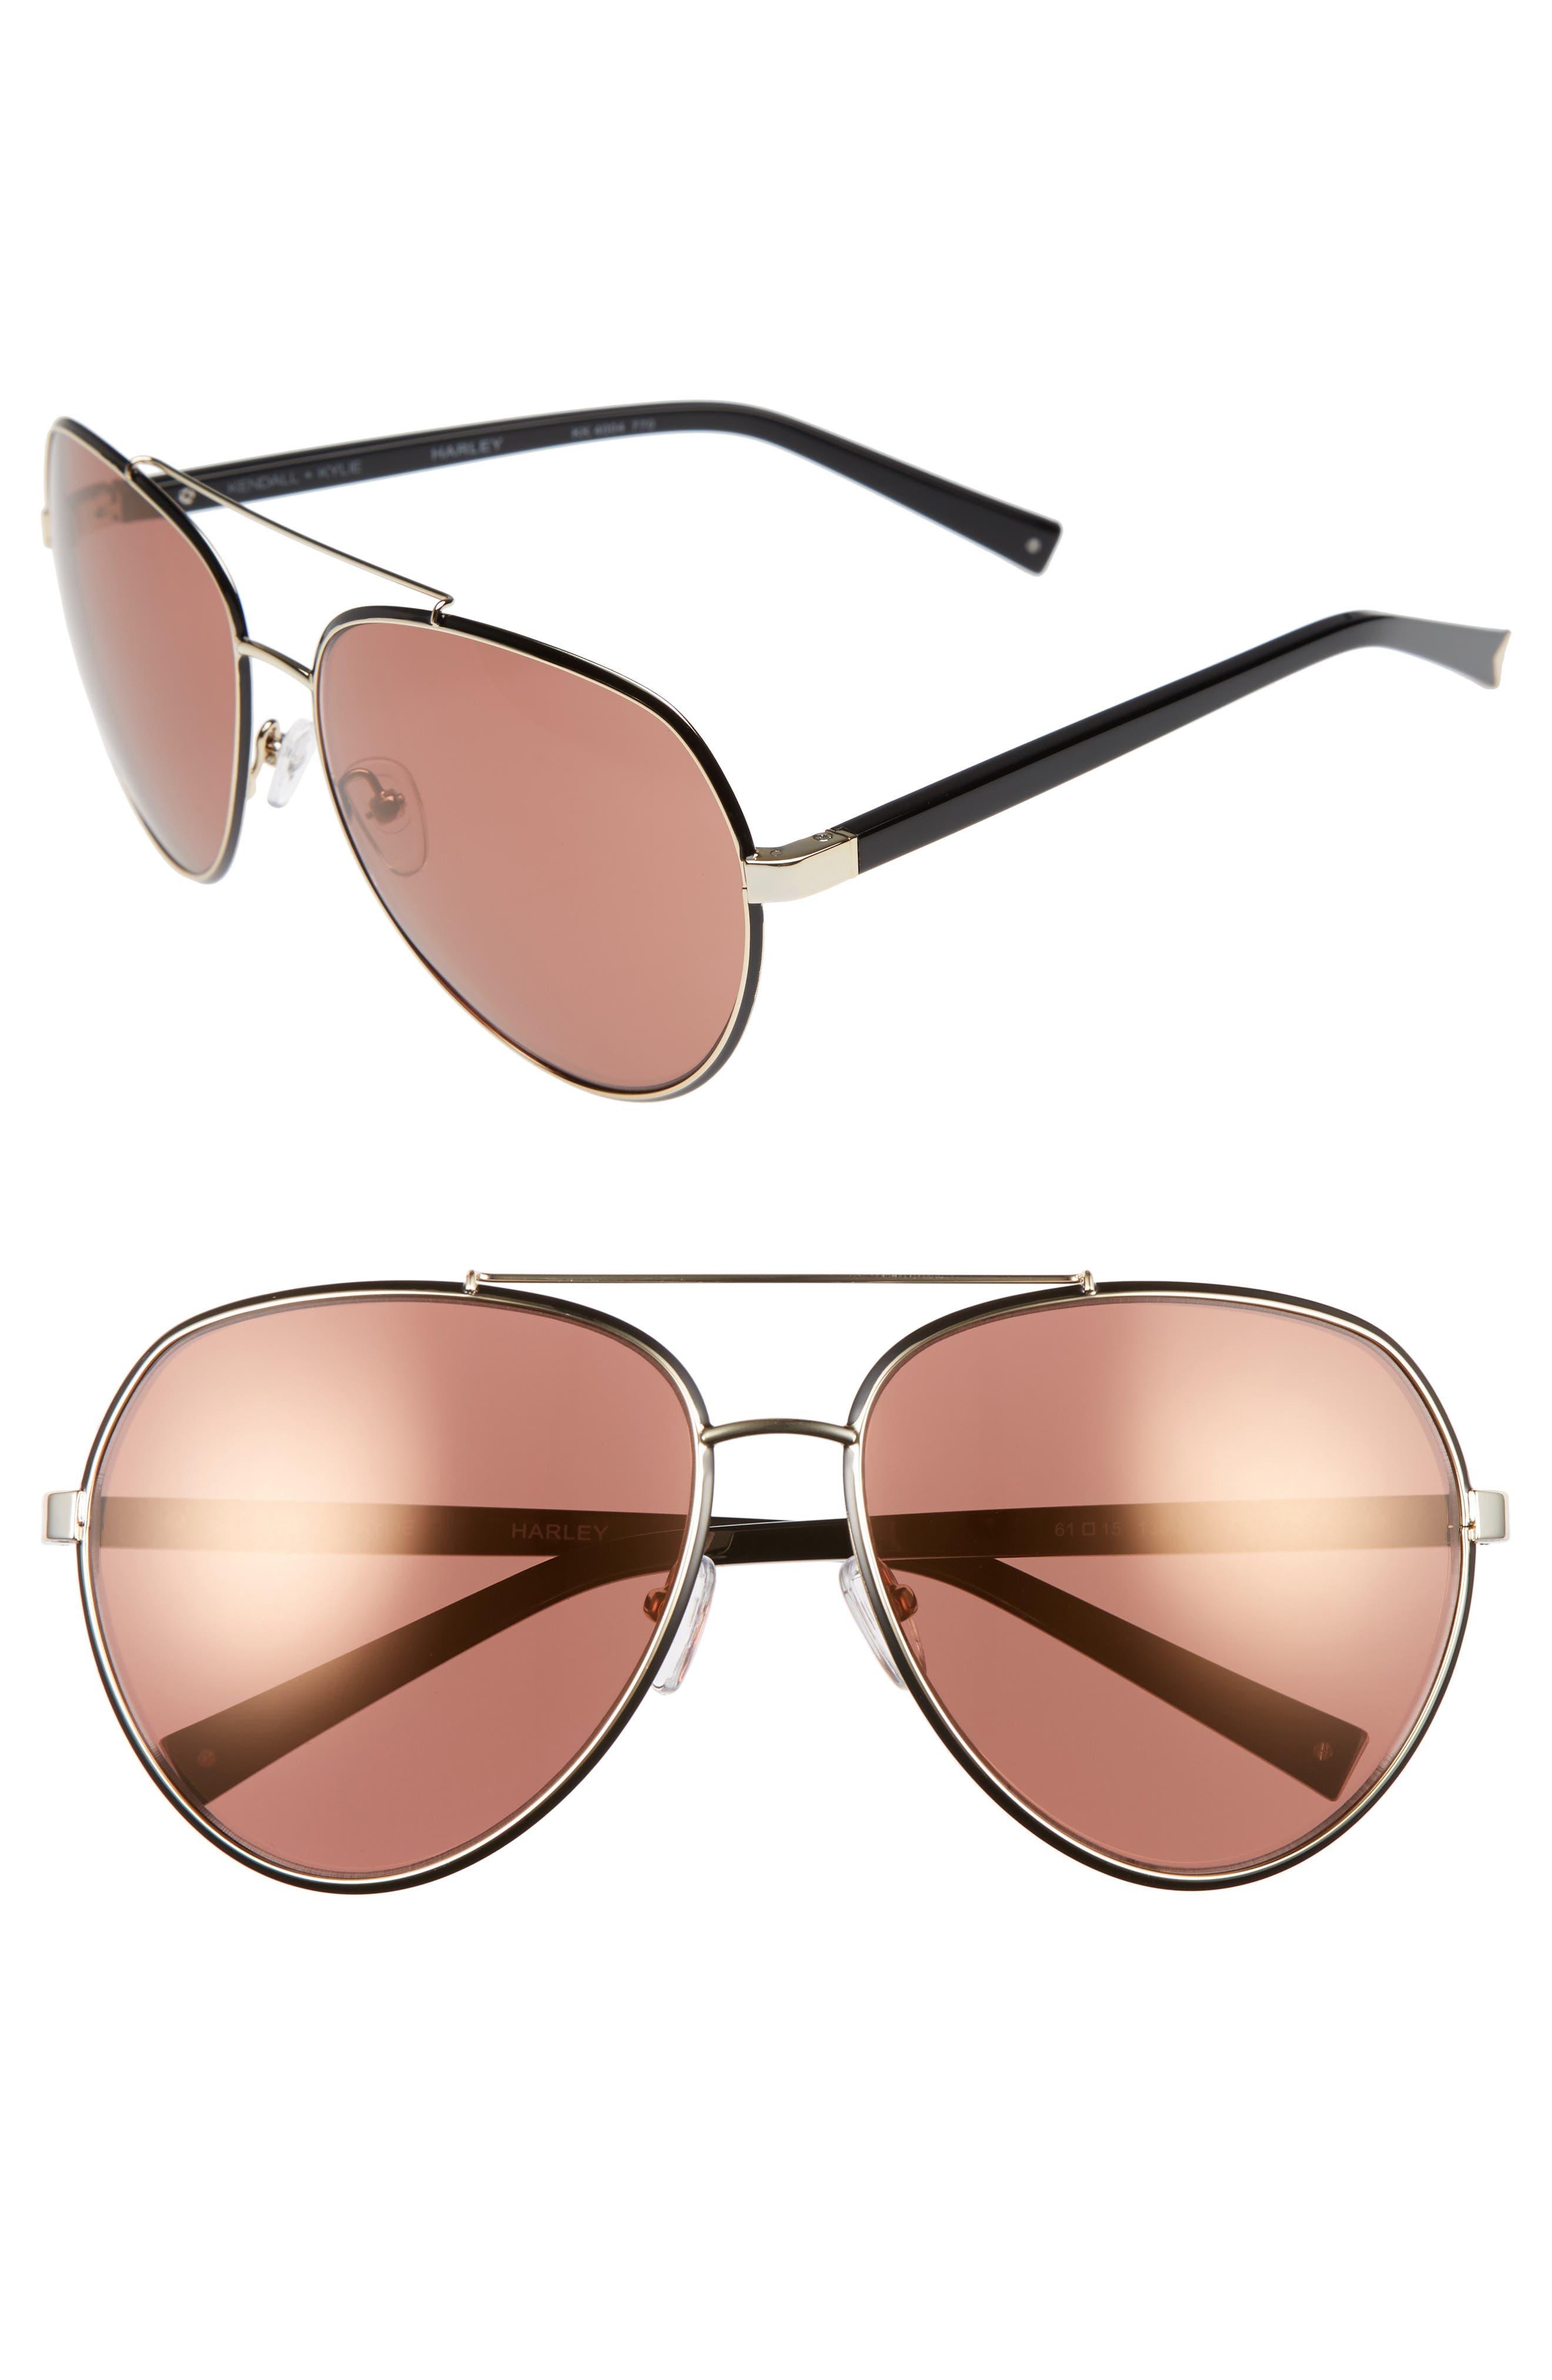 Main Image - KENDALL + KYLIE 61mm Aviator Sunglasses